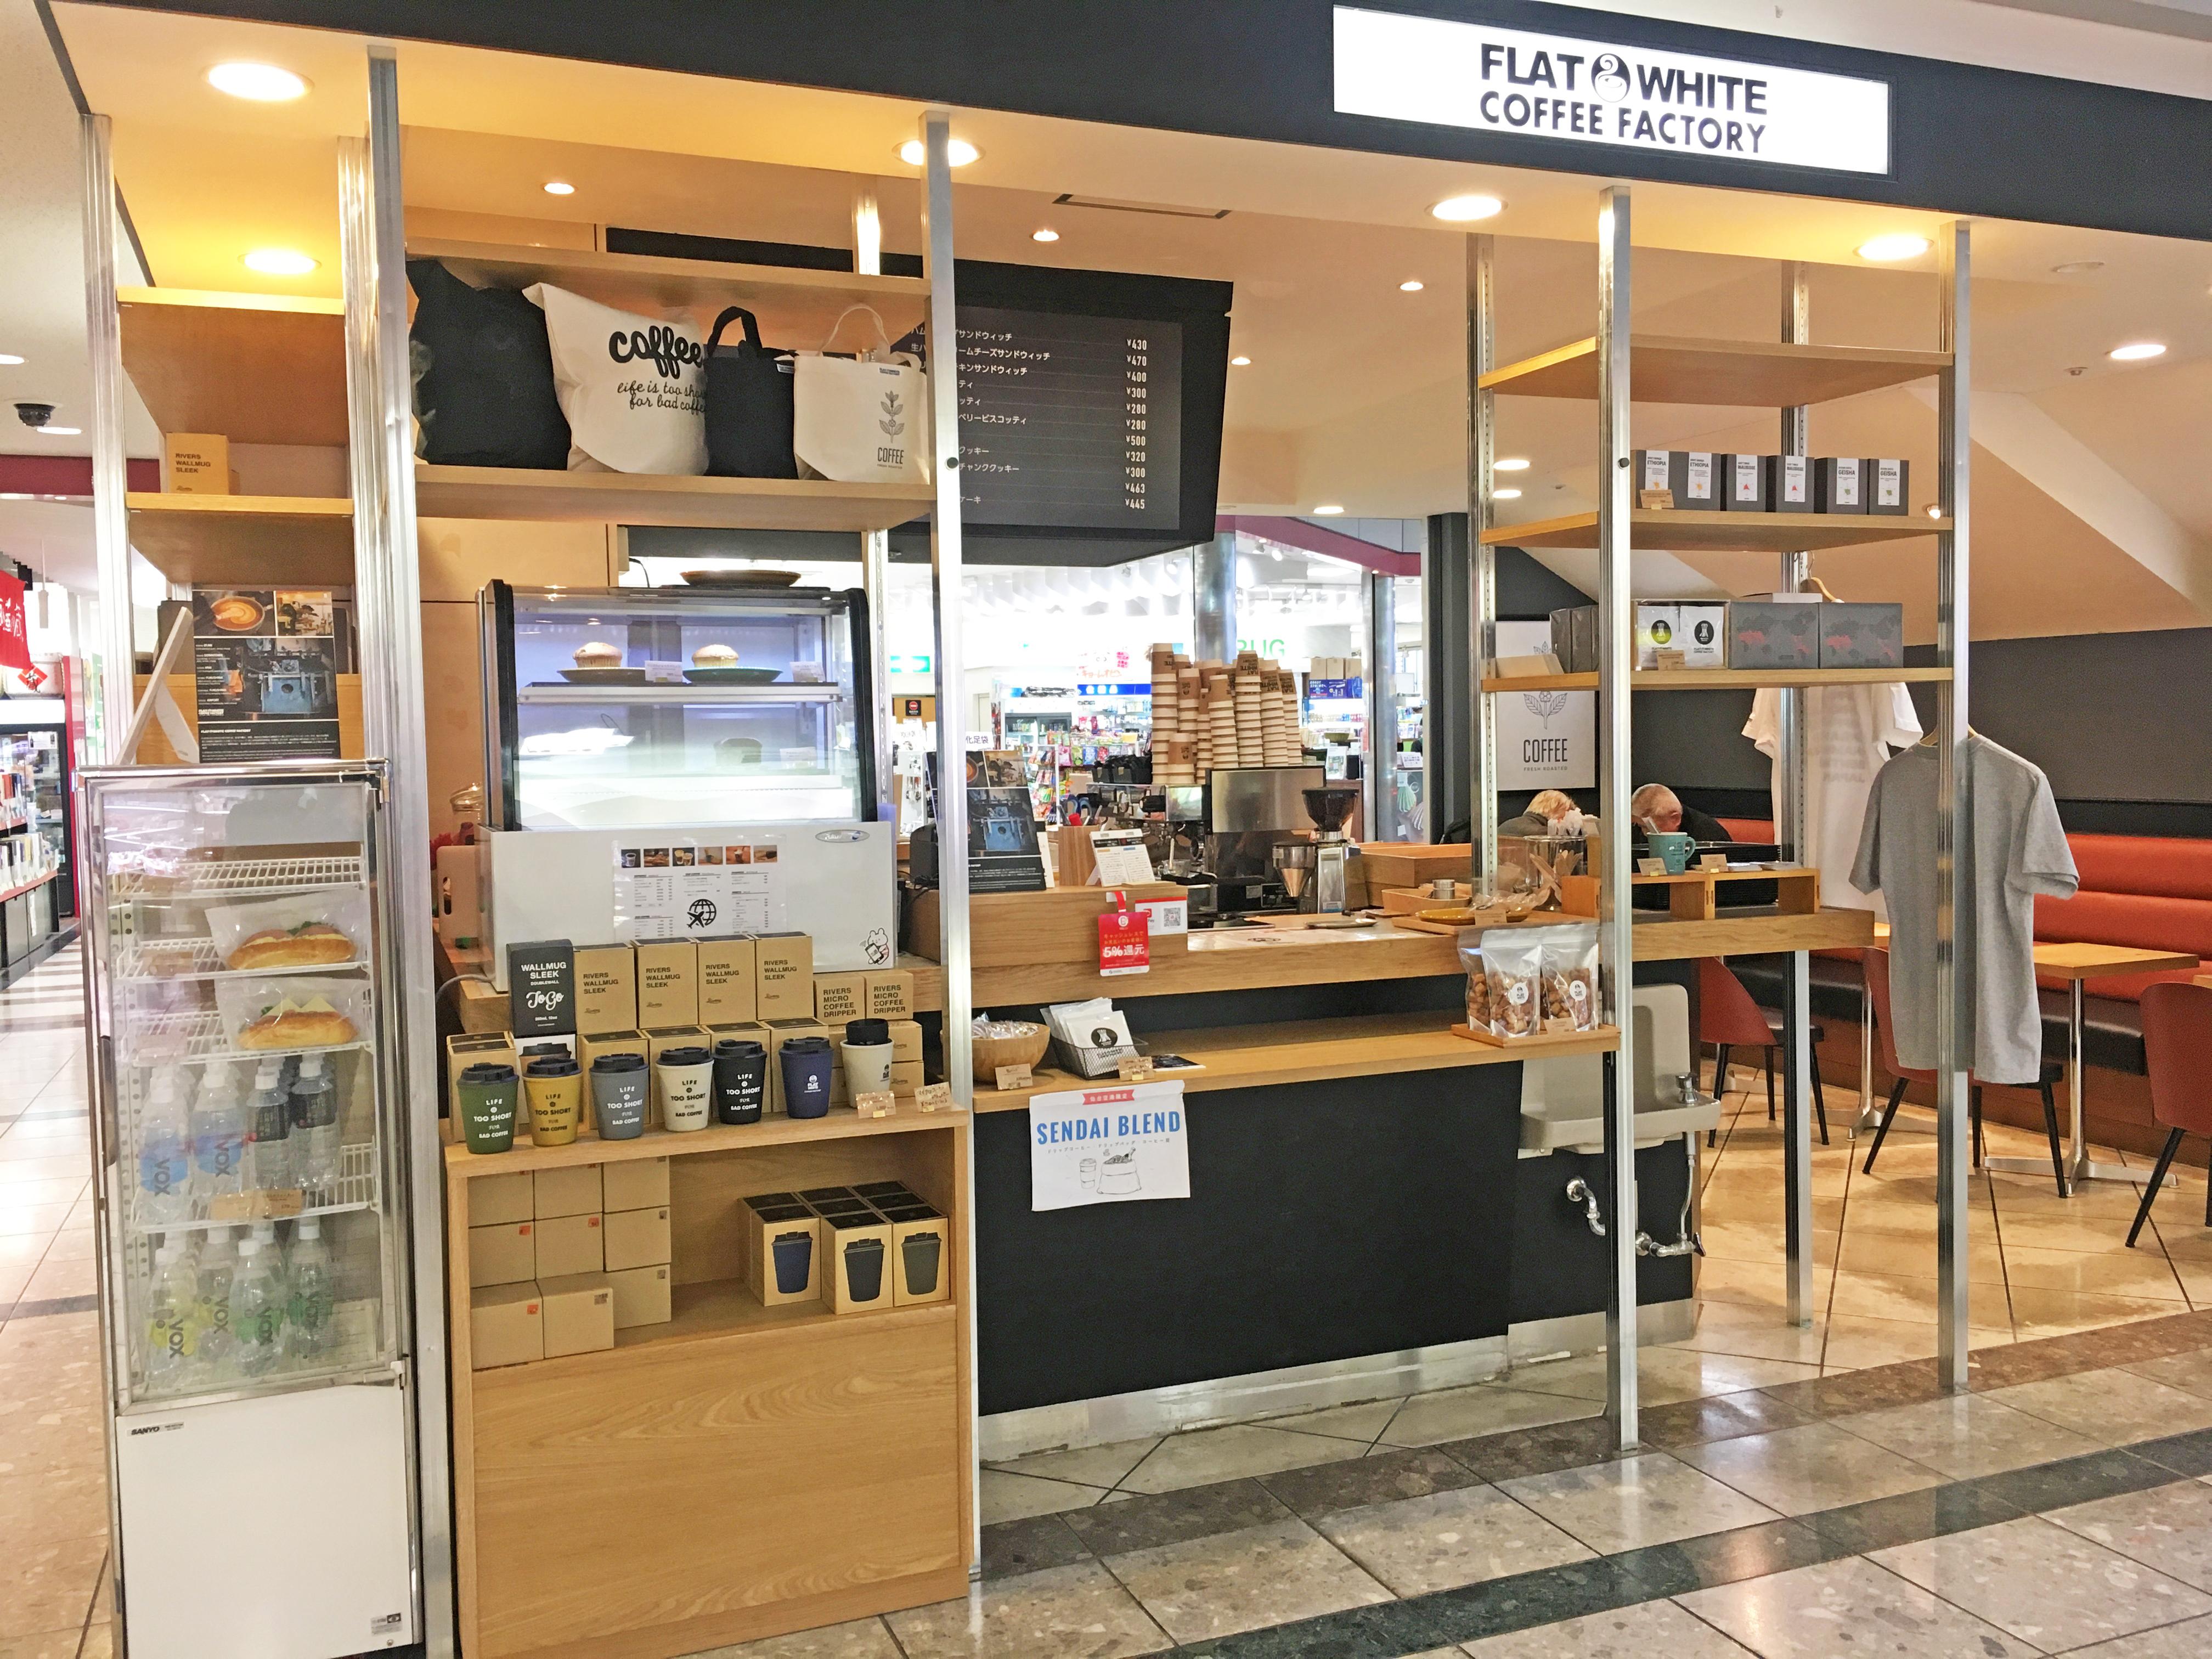 FLATWHITE COFFEE FACTORY 仙台机场店